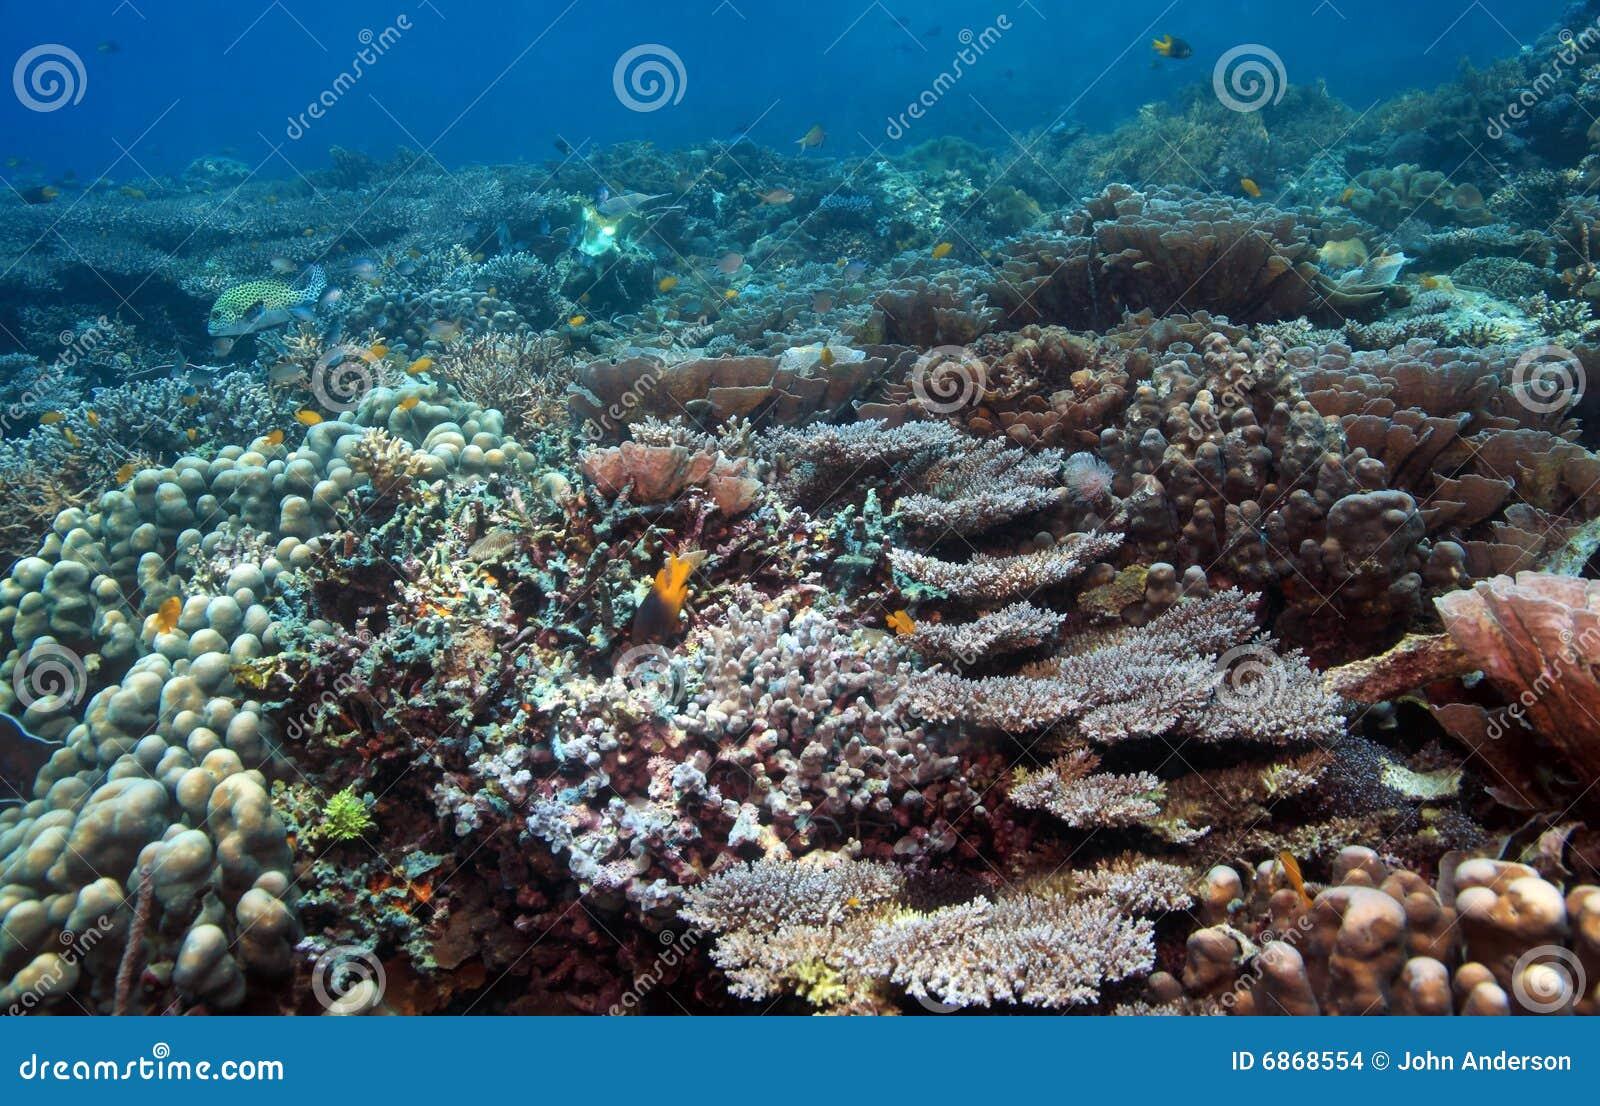 риф индонезийца коралла